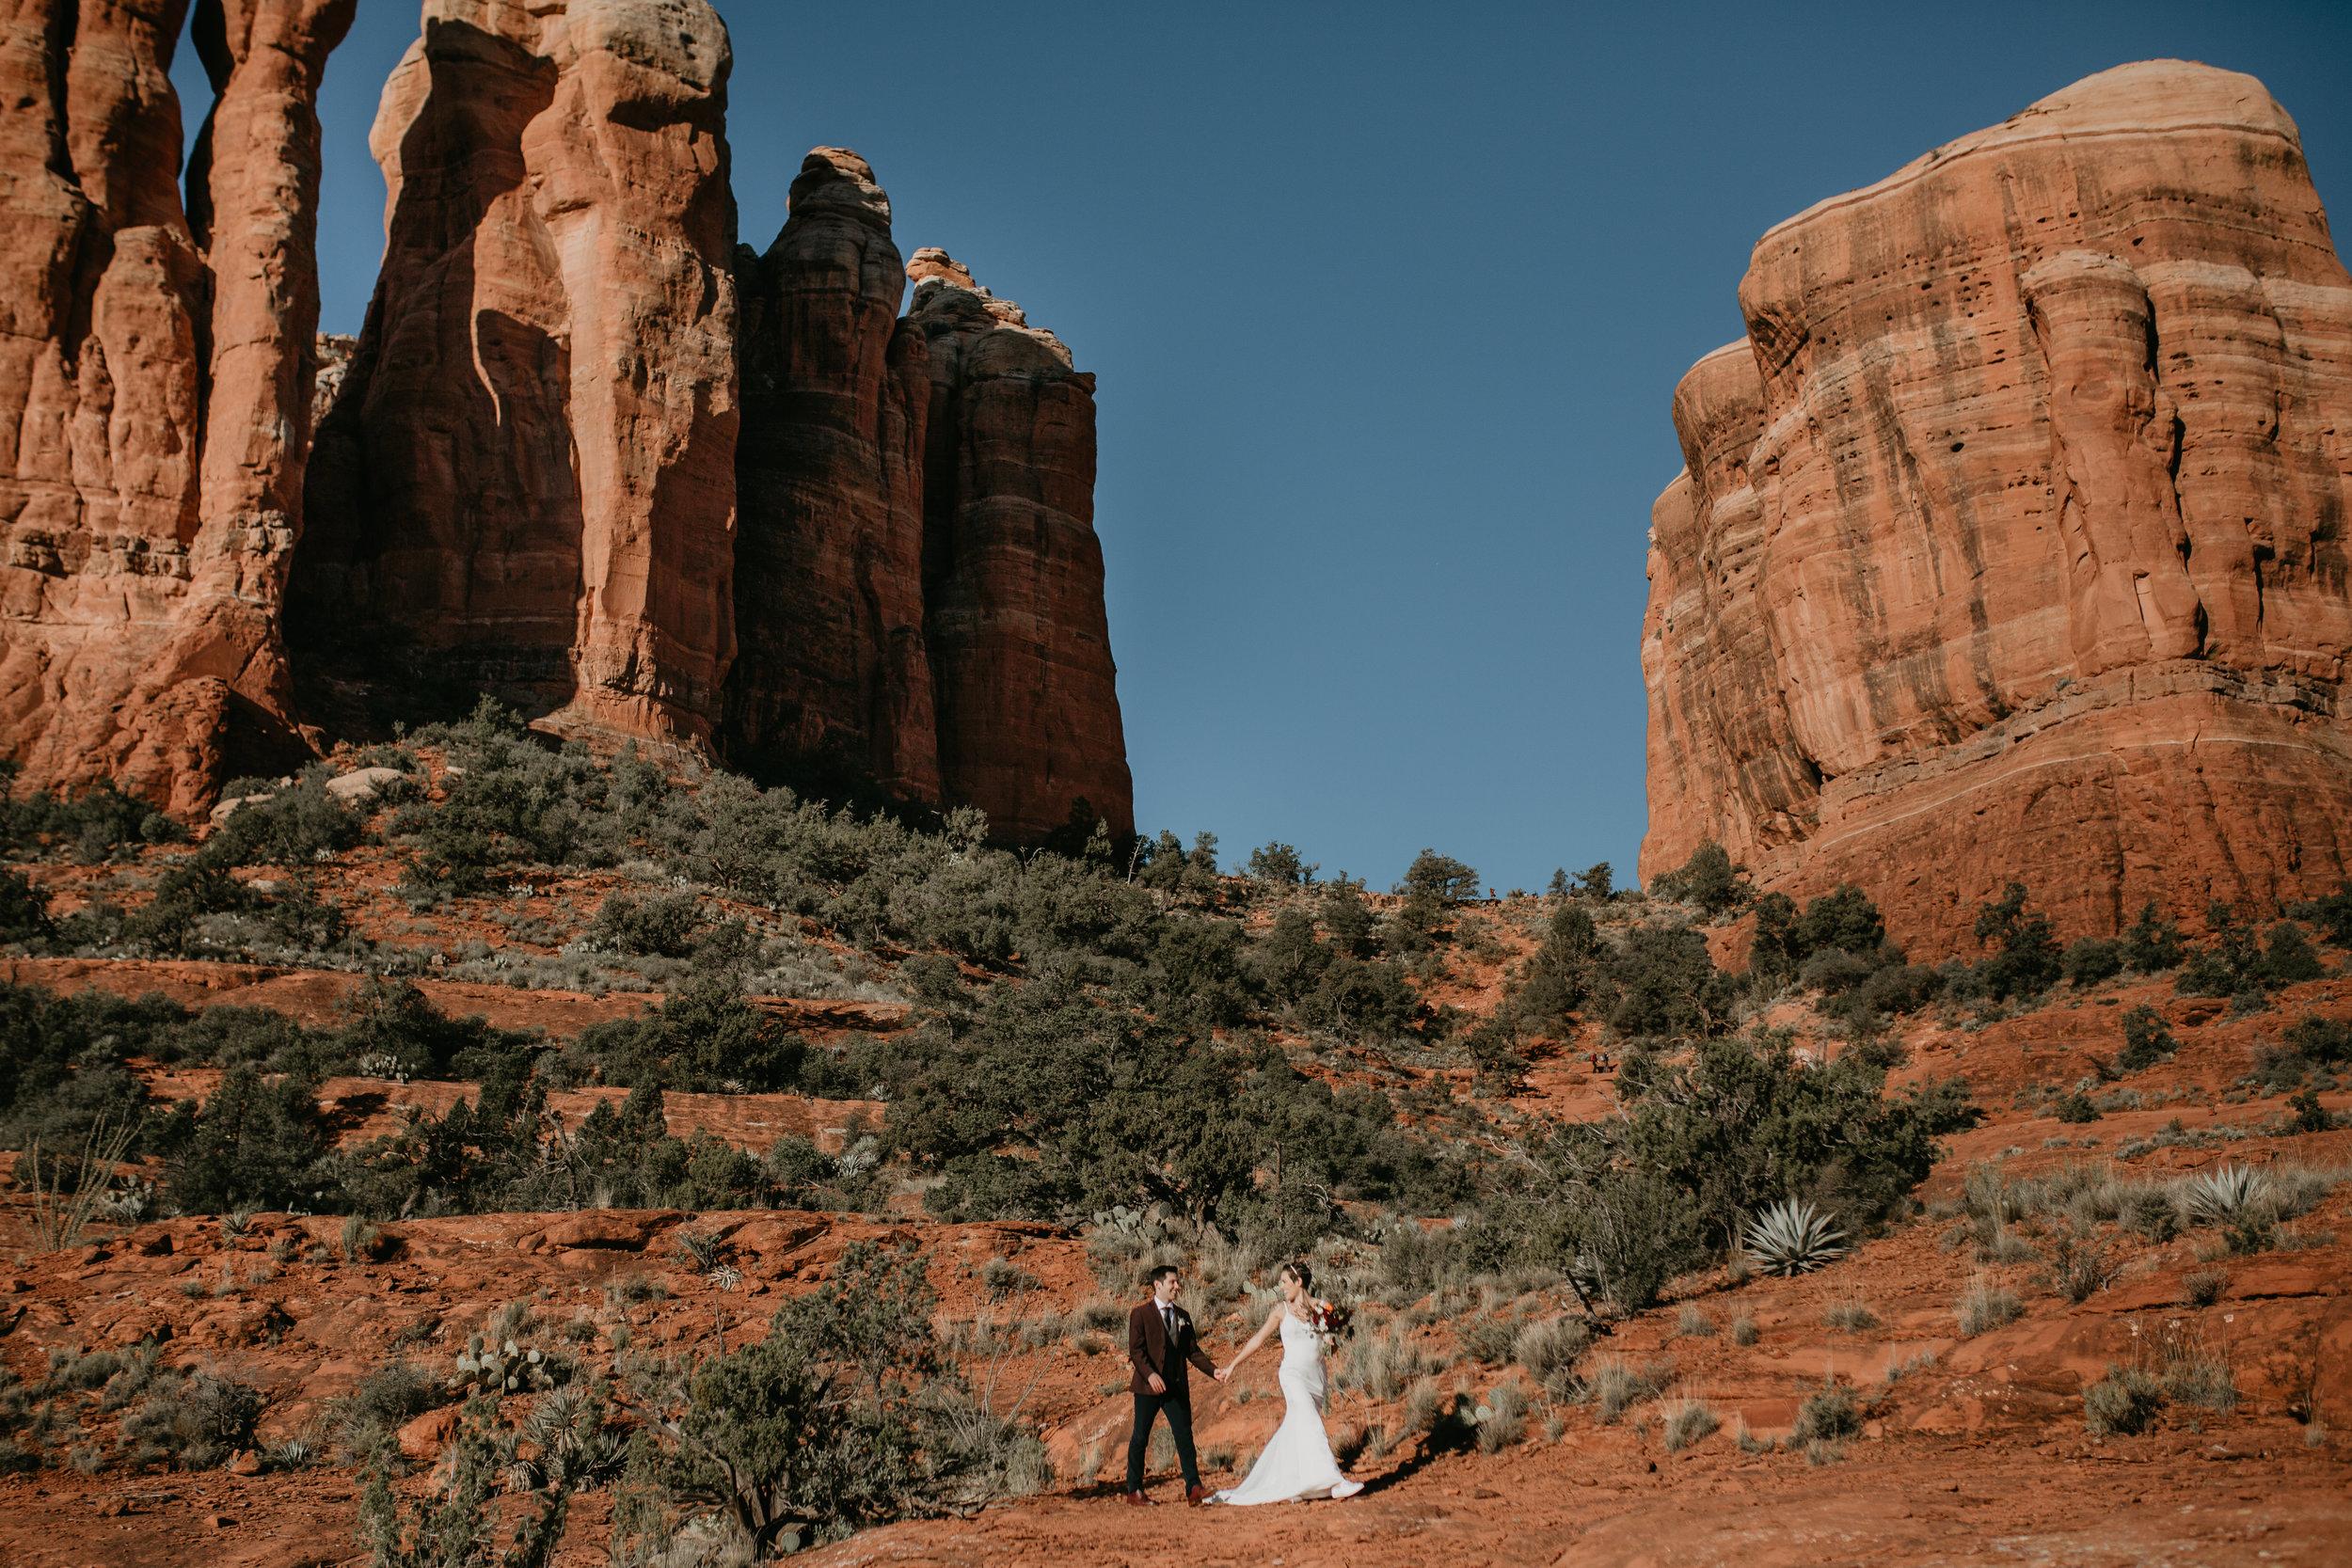 nicole-daacke-photography-sedona-arizona-destination-elopement-wedding-photographer-catherdral-rock-hiking-elopement-sedona-river-elopement-photos-desert-rock-wedding-photographer-laid-back-spontaneous-elopement-72.jpg